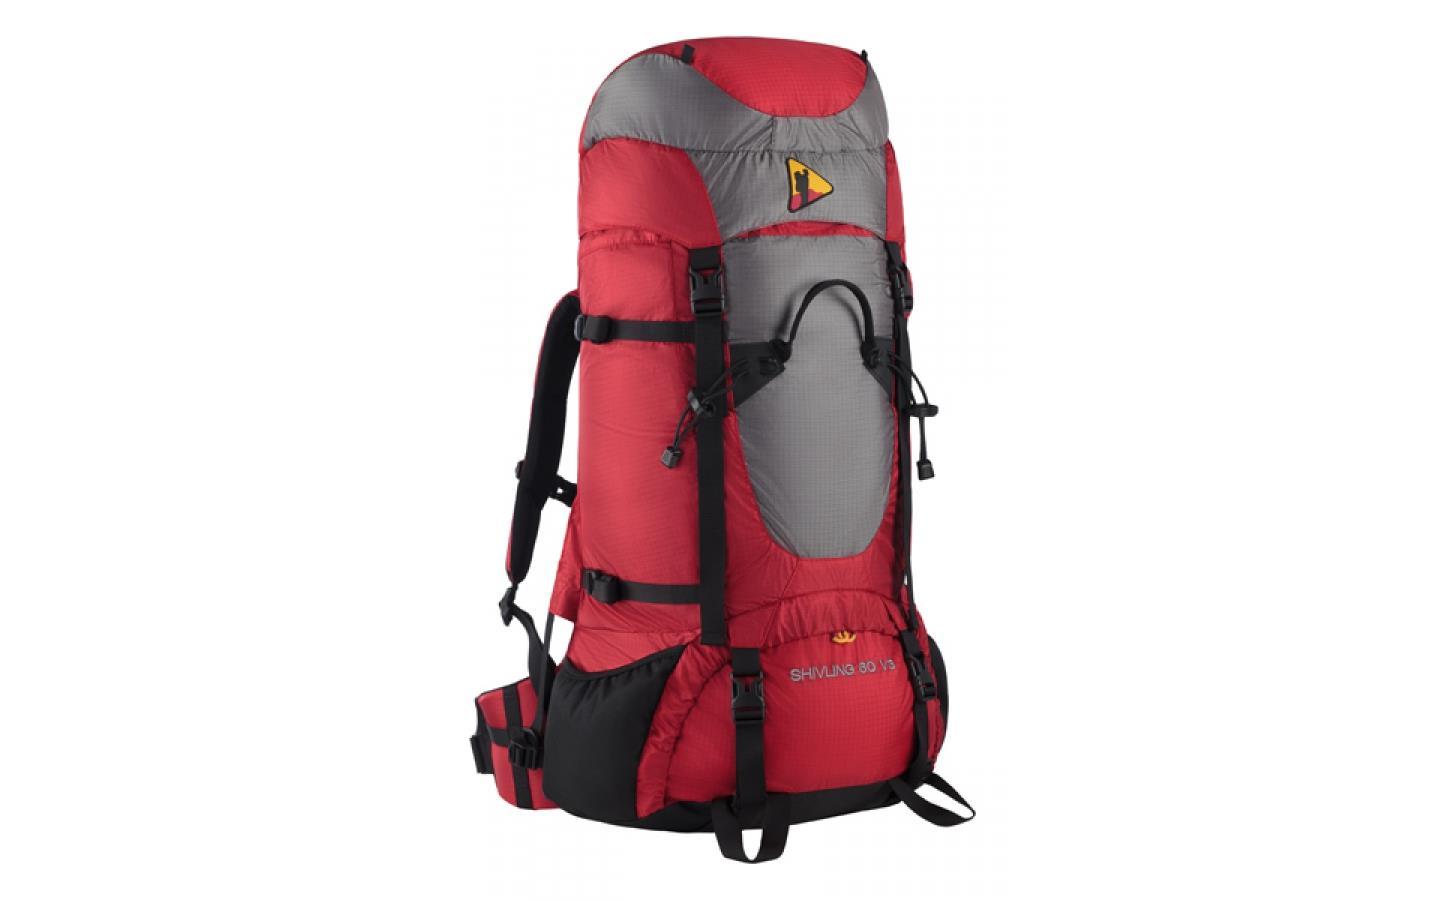 fb100307131f Рюкзак BASK SHIVLING 60 V3 купить по цене в 9 690 р в интернет ...